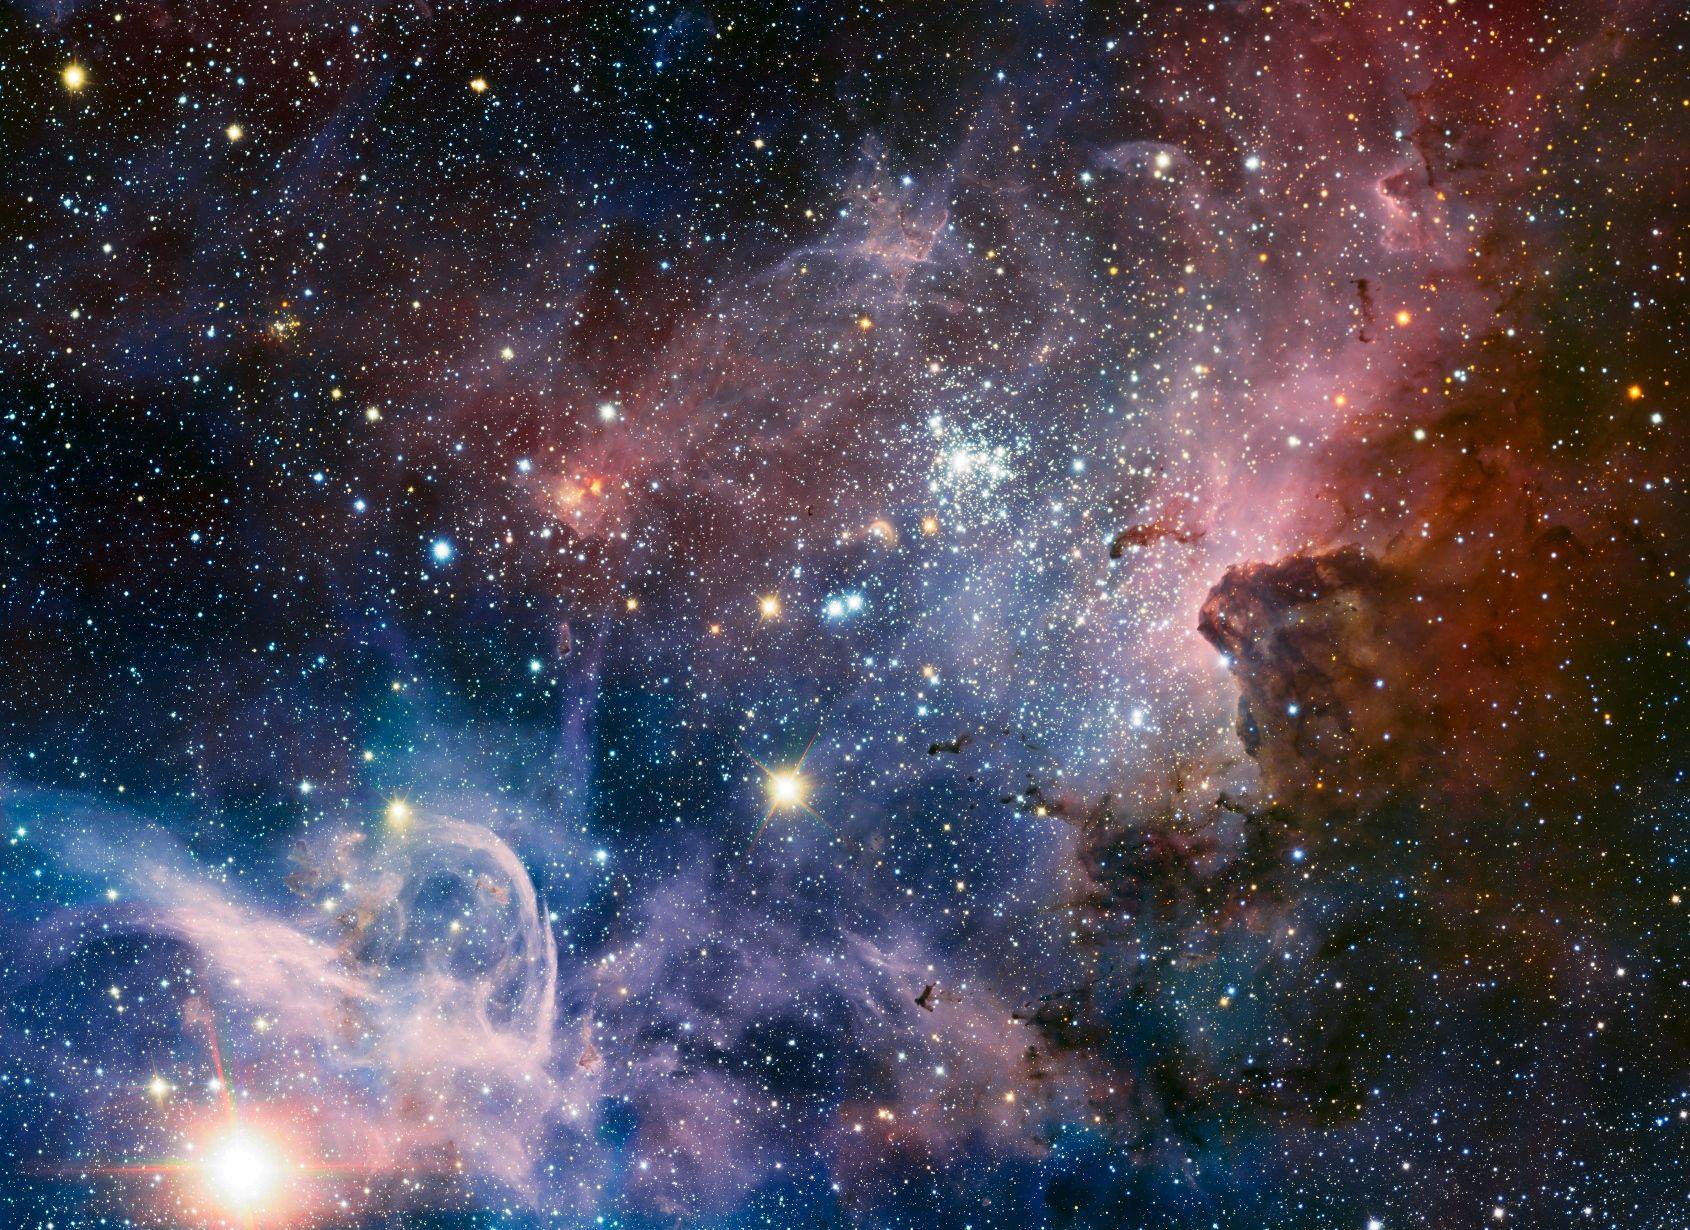 Stellar Nursery The Carina Nebula A Mive